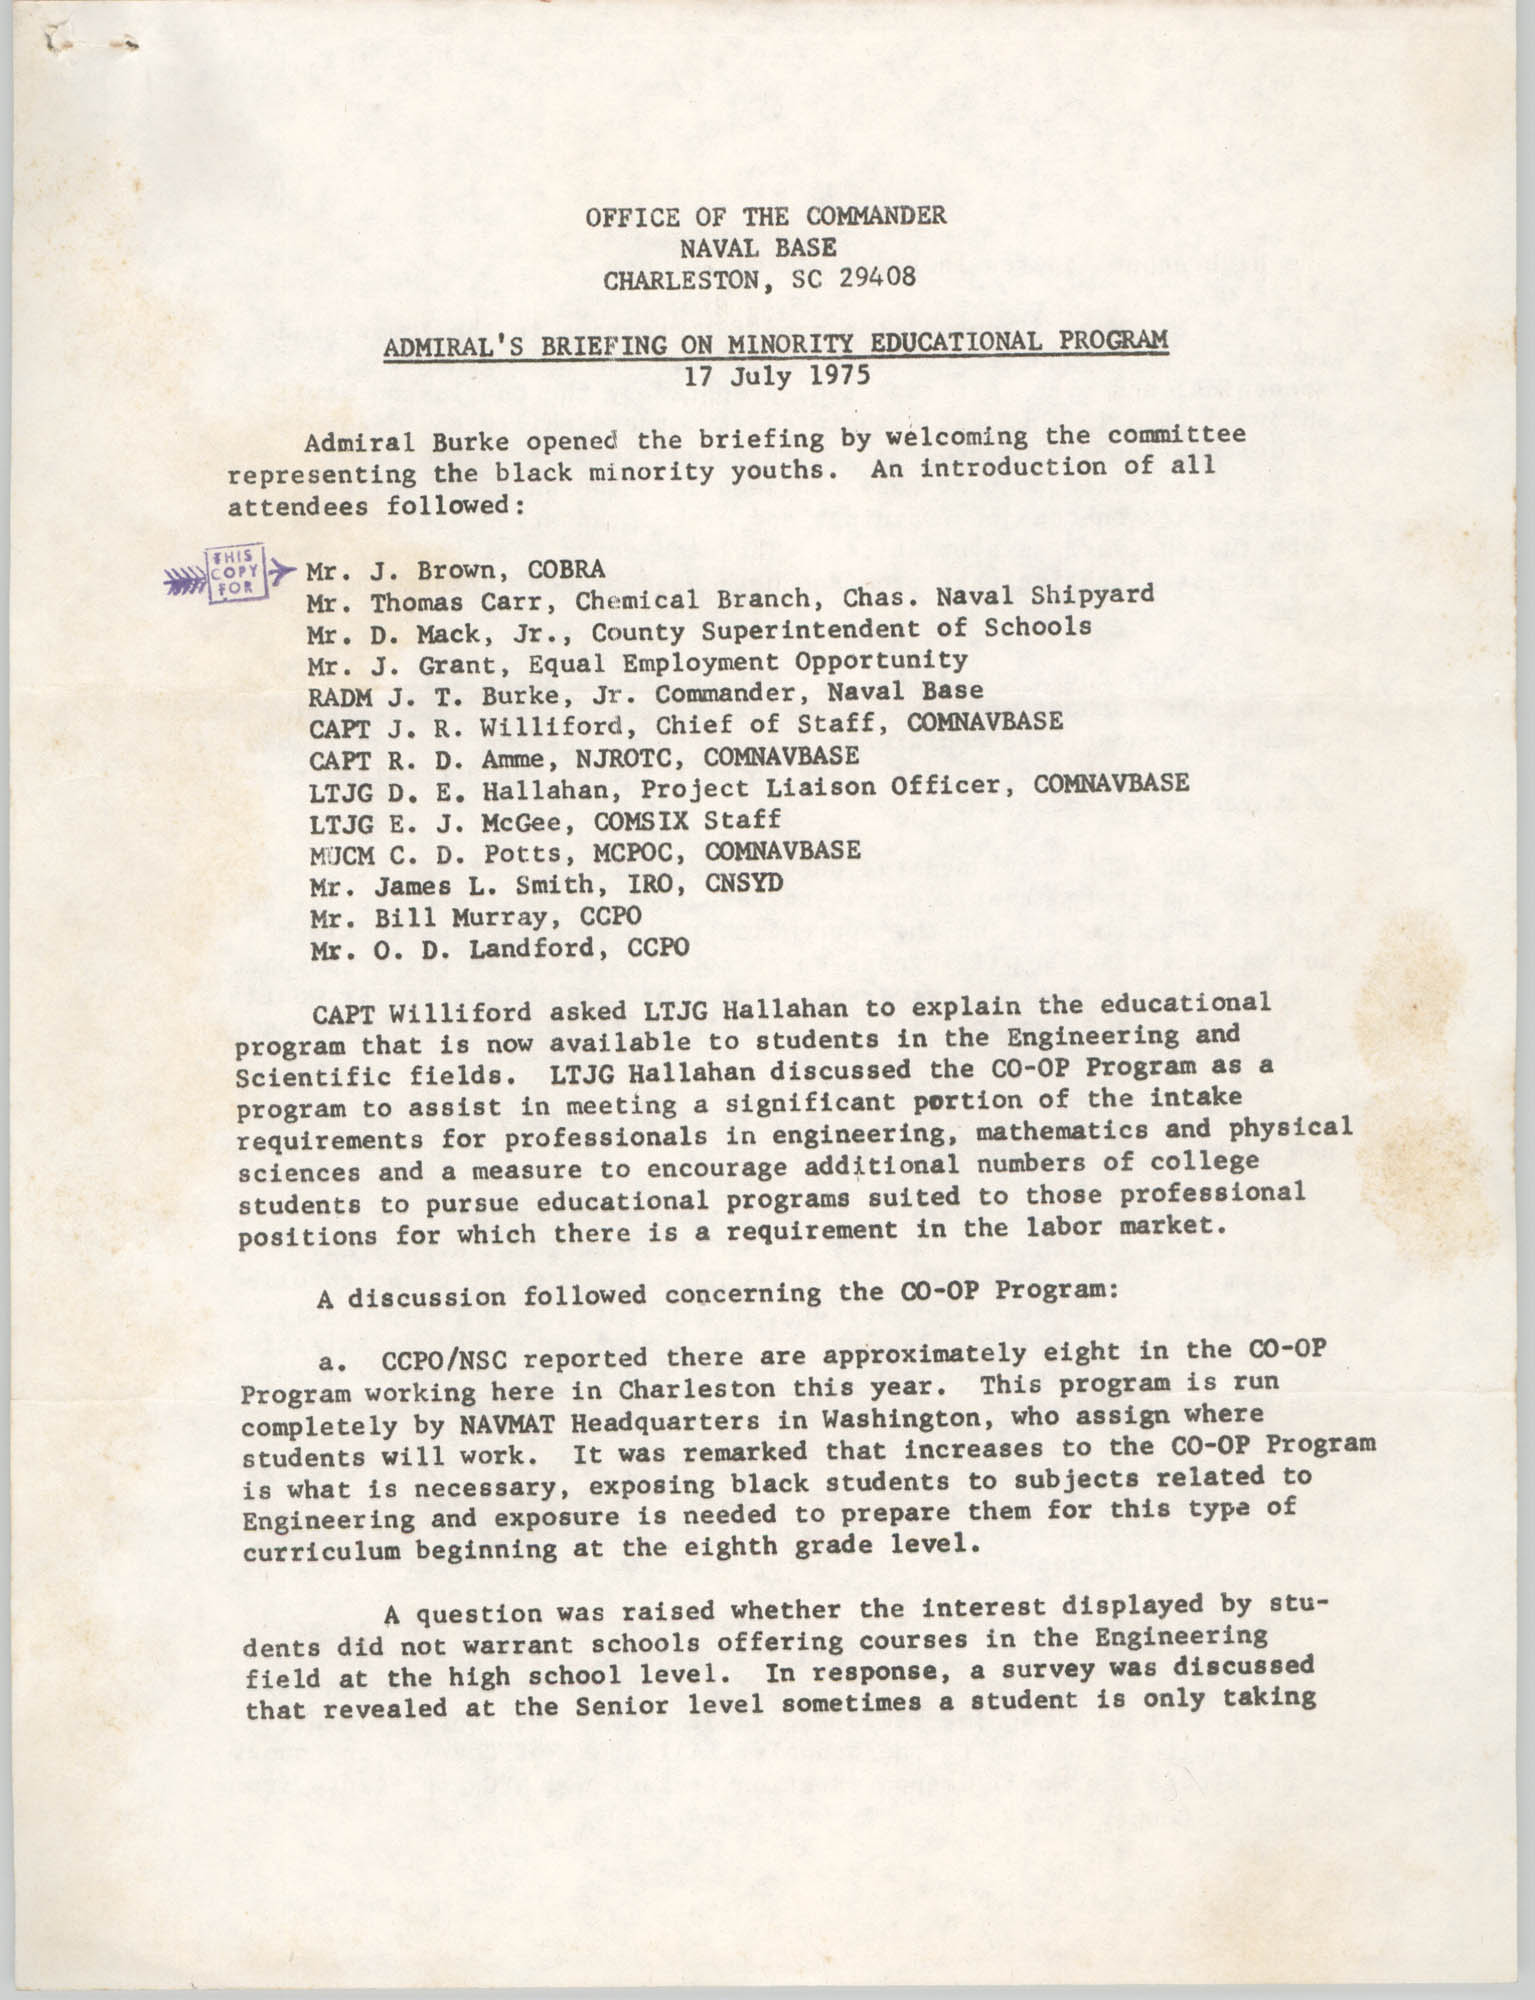 Admiral's Briefing on Minority Educational Program, July 17, 1975